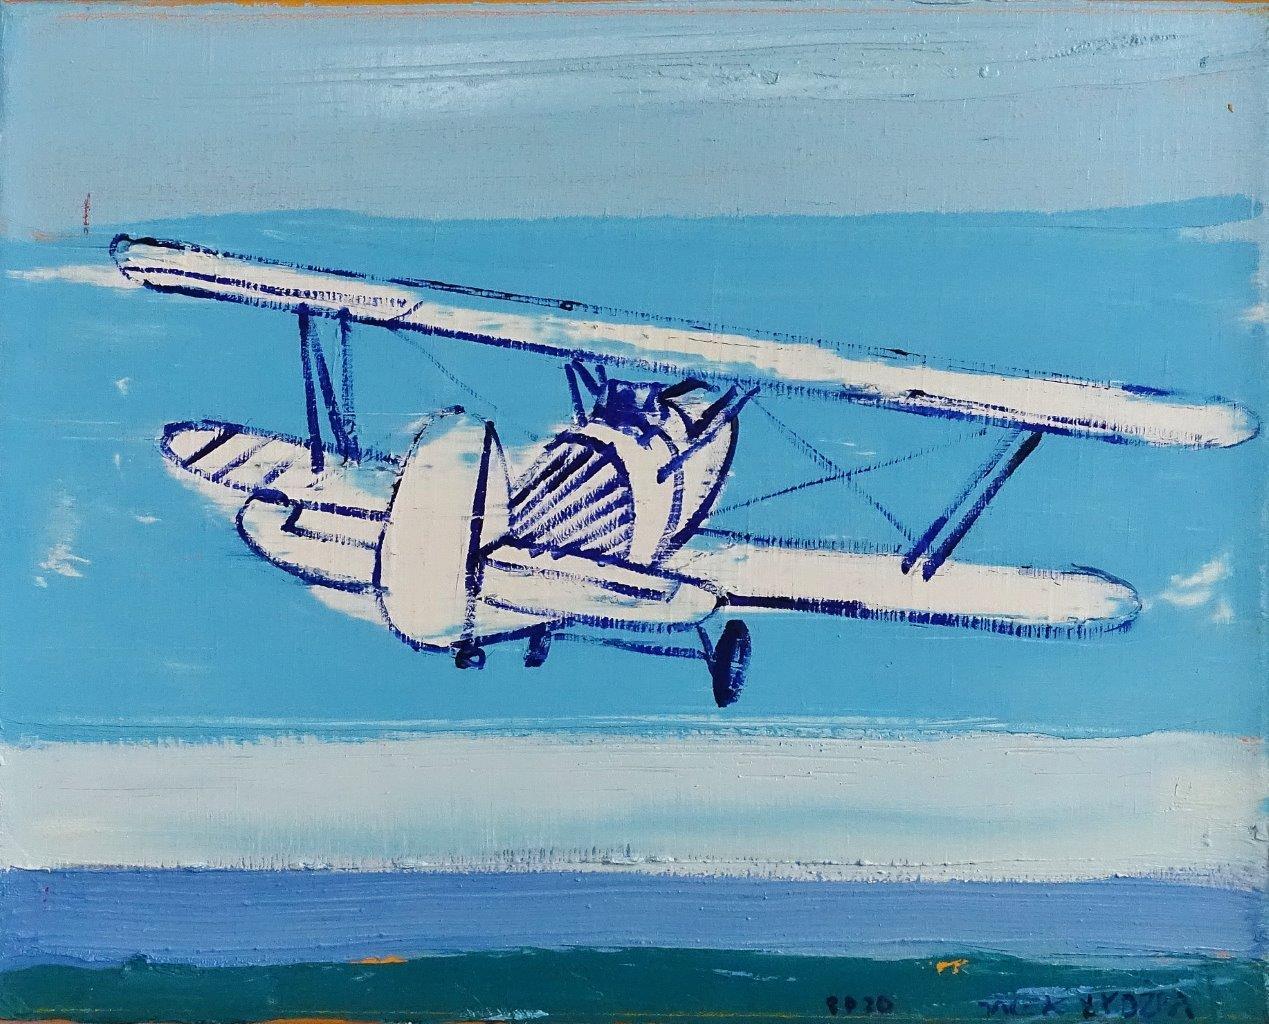 Jacek Łydżba : Takeoff